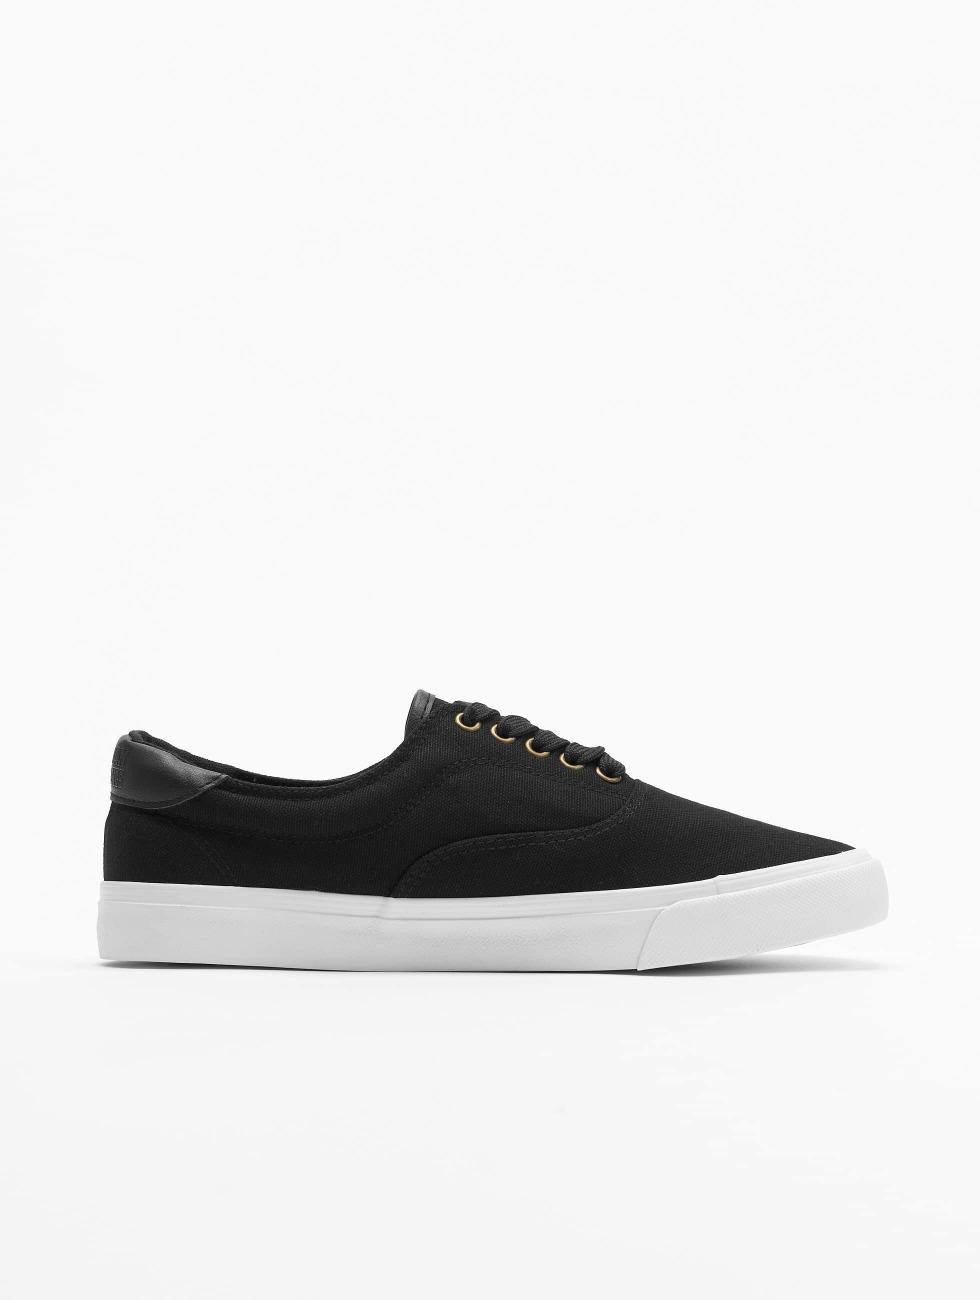 Classici Urbani Scarpa / Sneaker Bassa Nera 477 474 baGOw